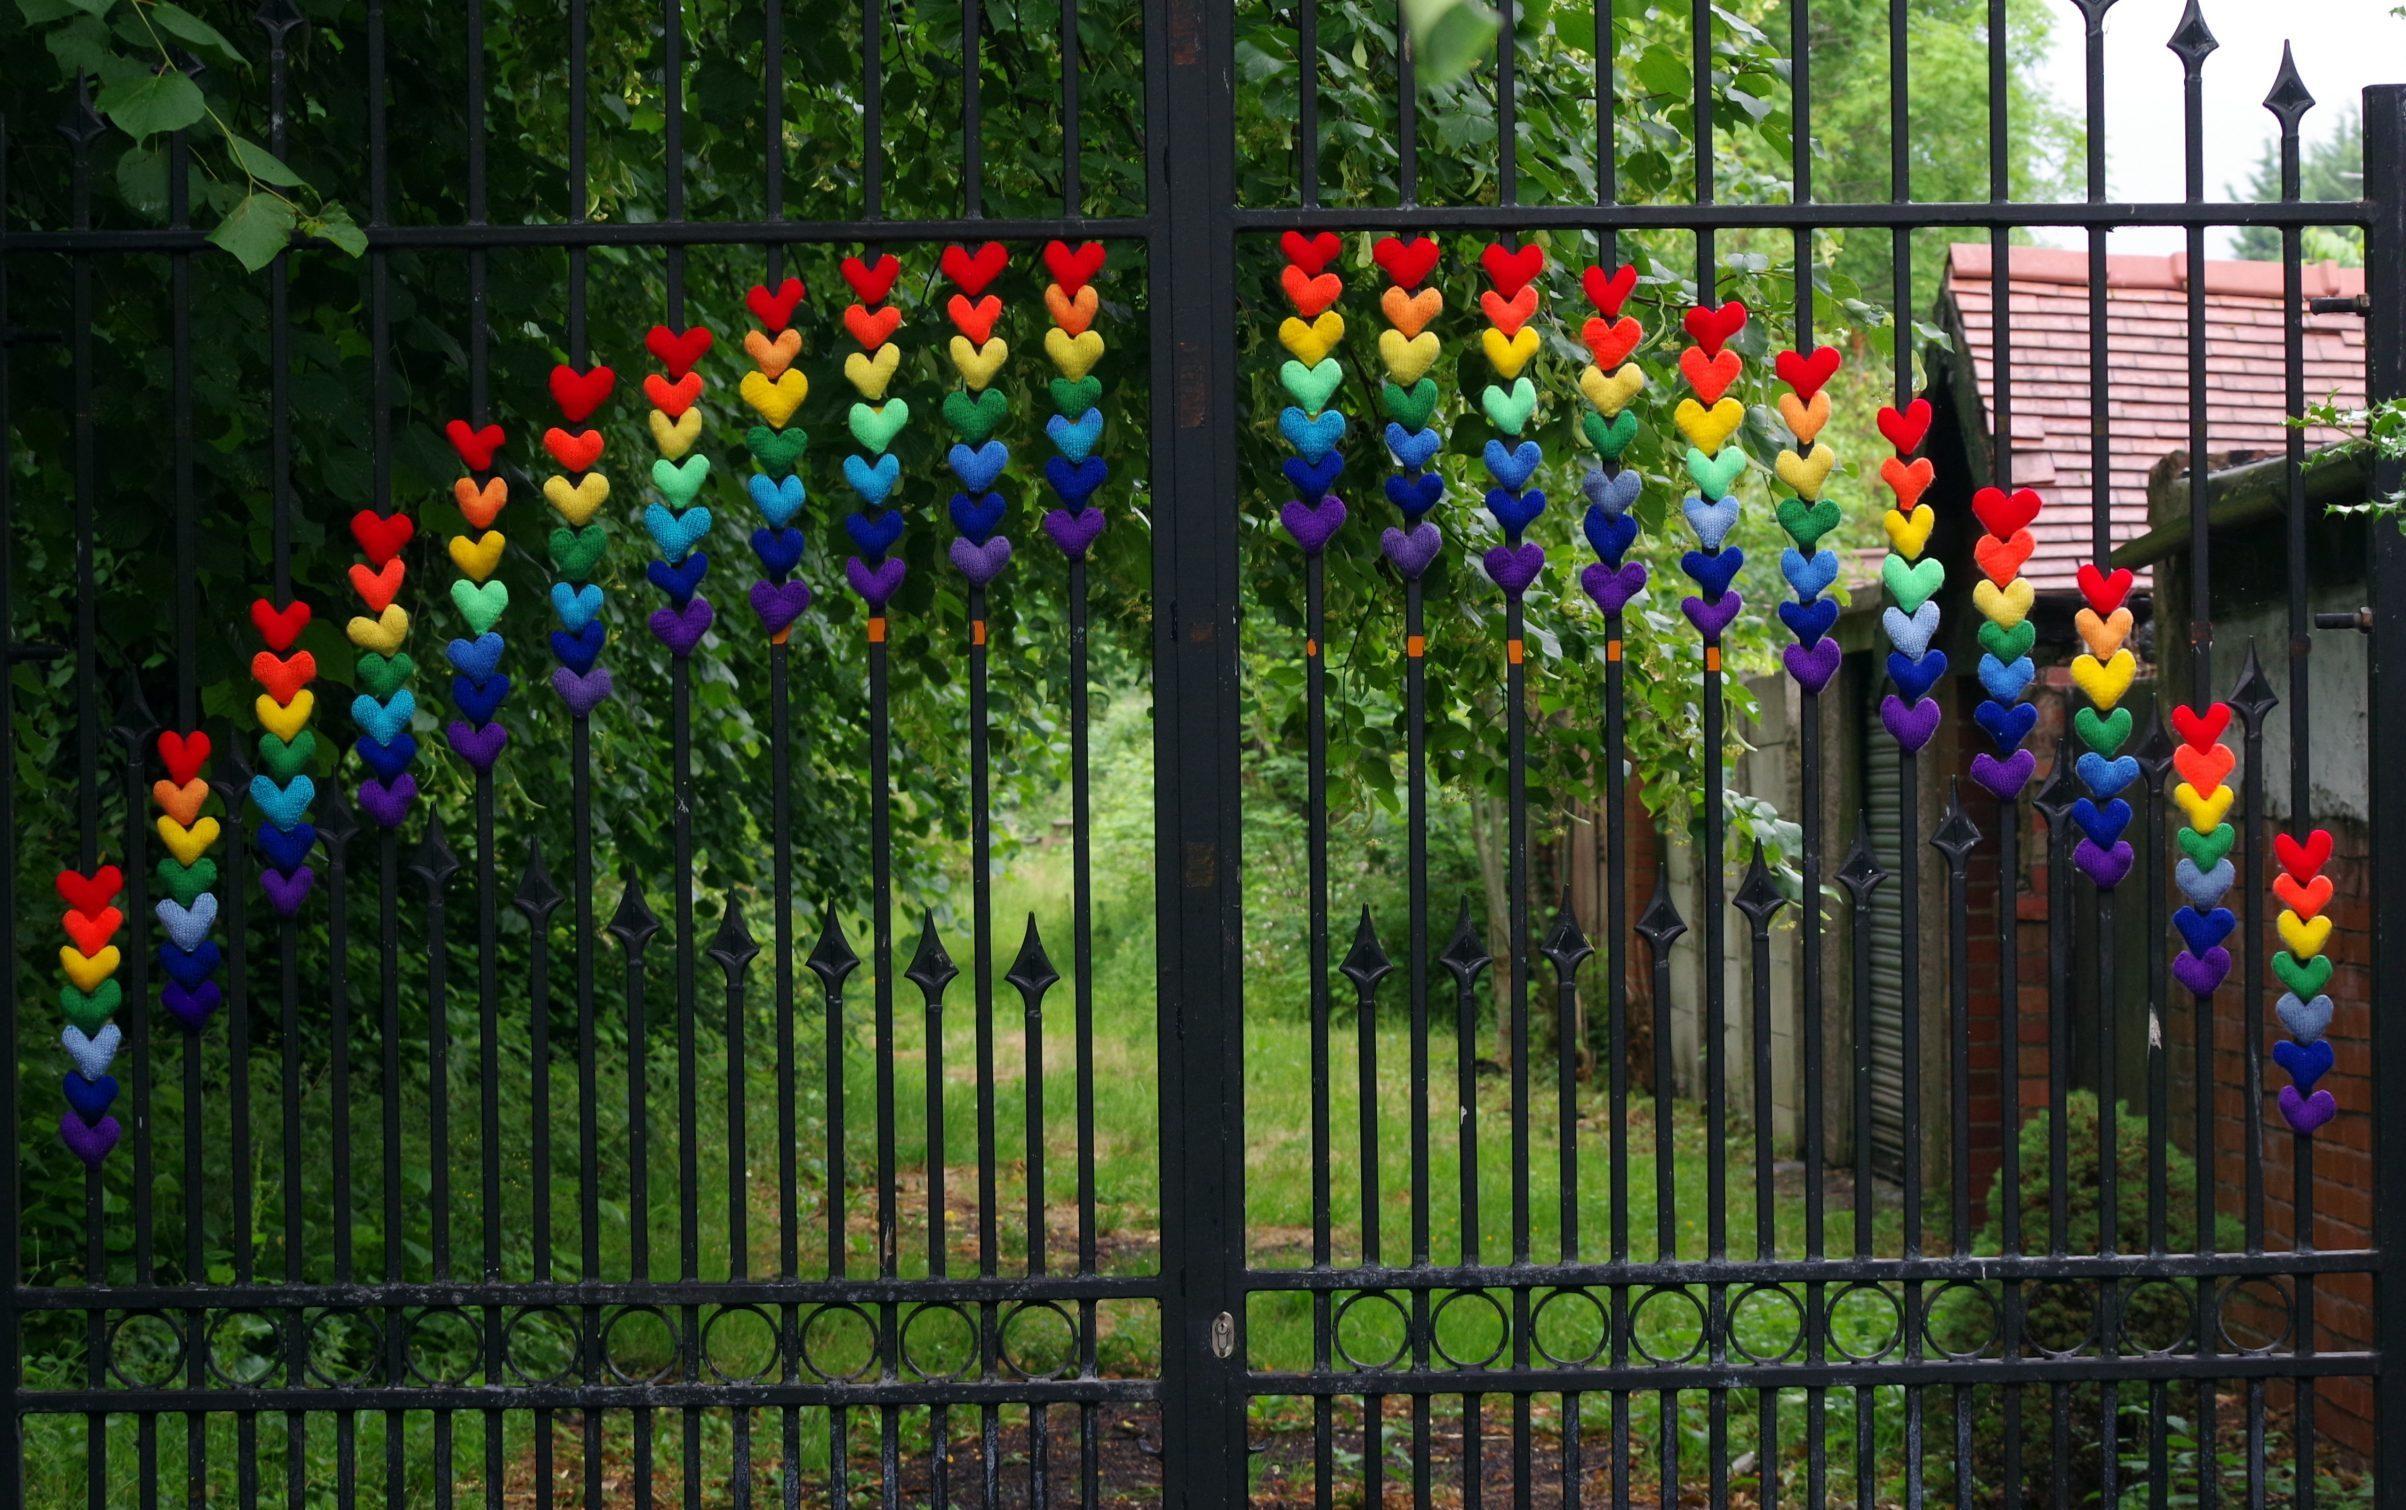 Rainbow stuck to gates of garden